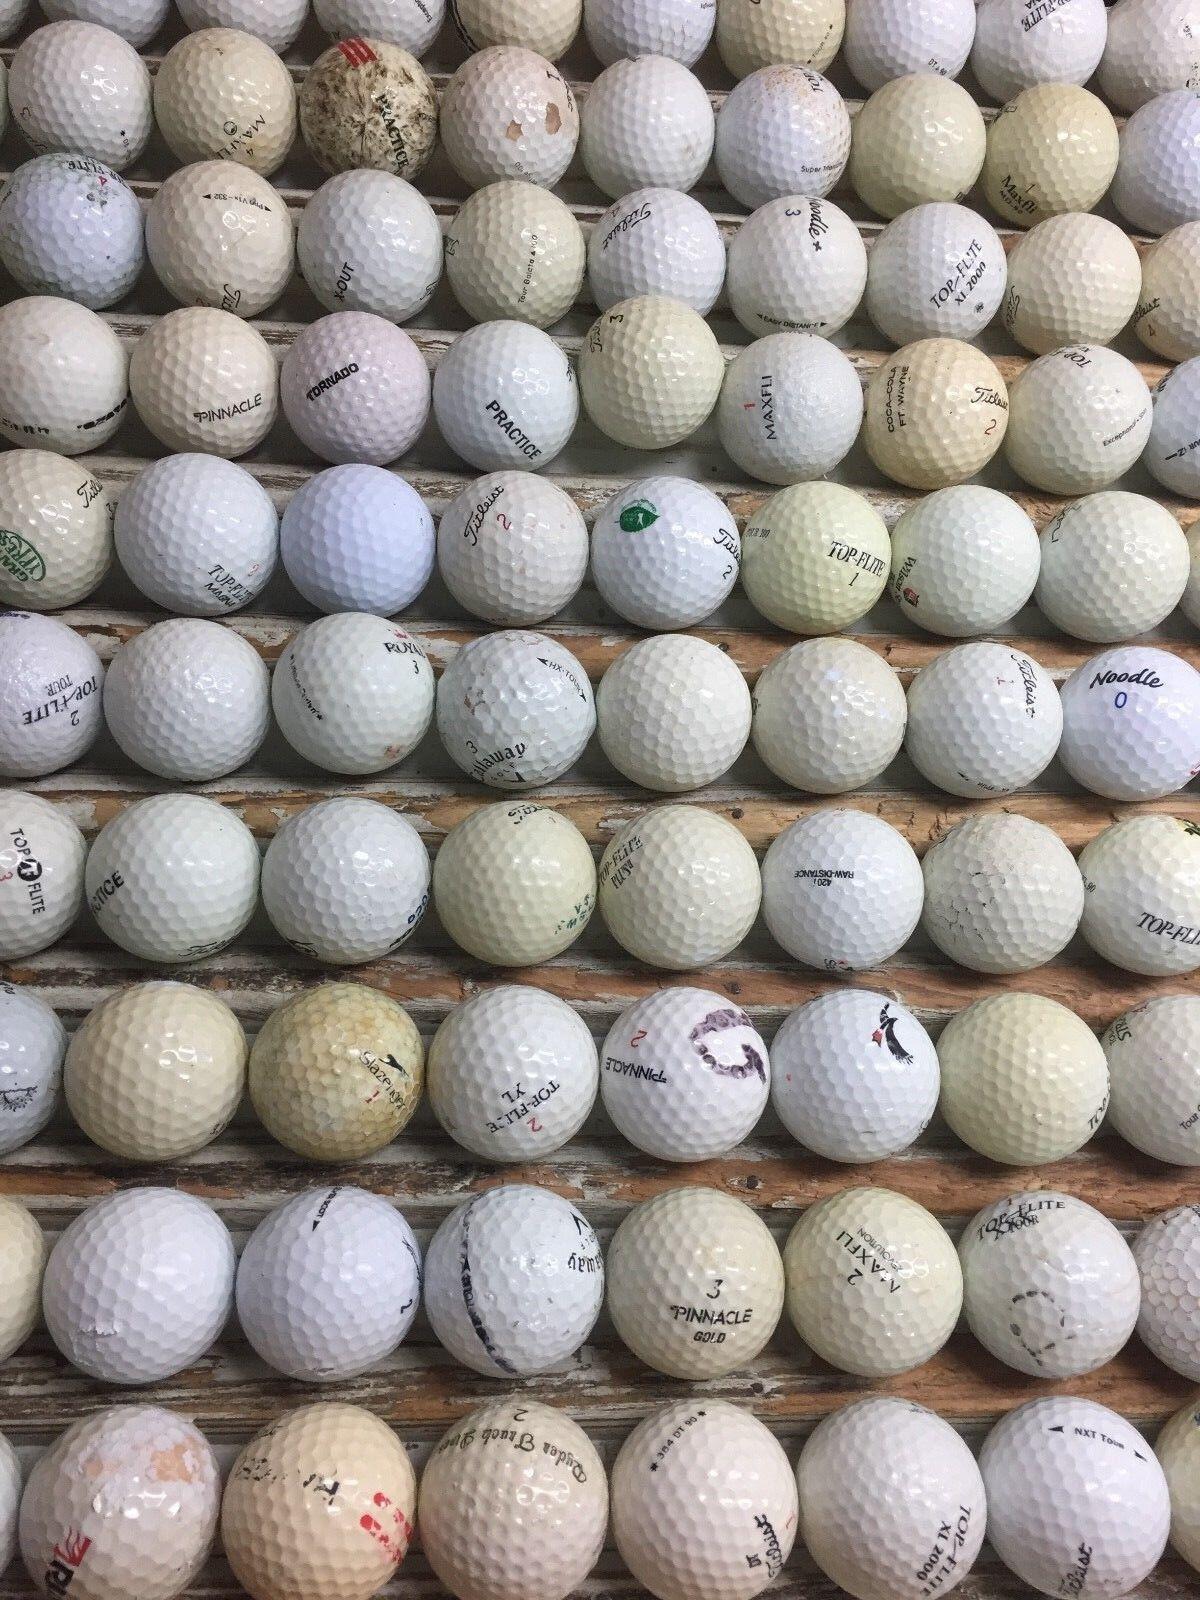 ::100 Hit-Away Shag Practice Range Used Golf Balls